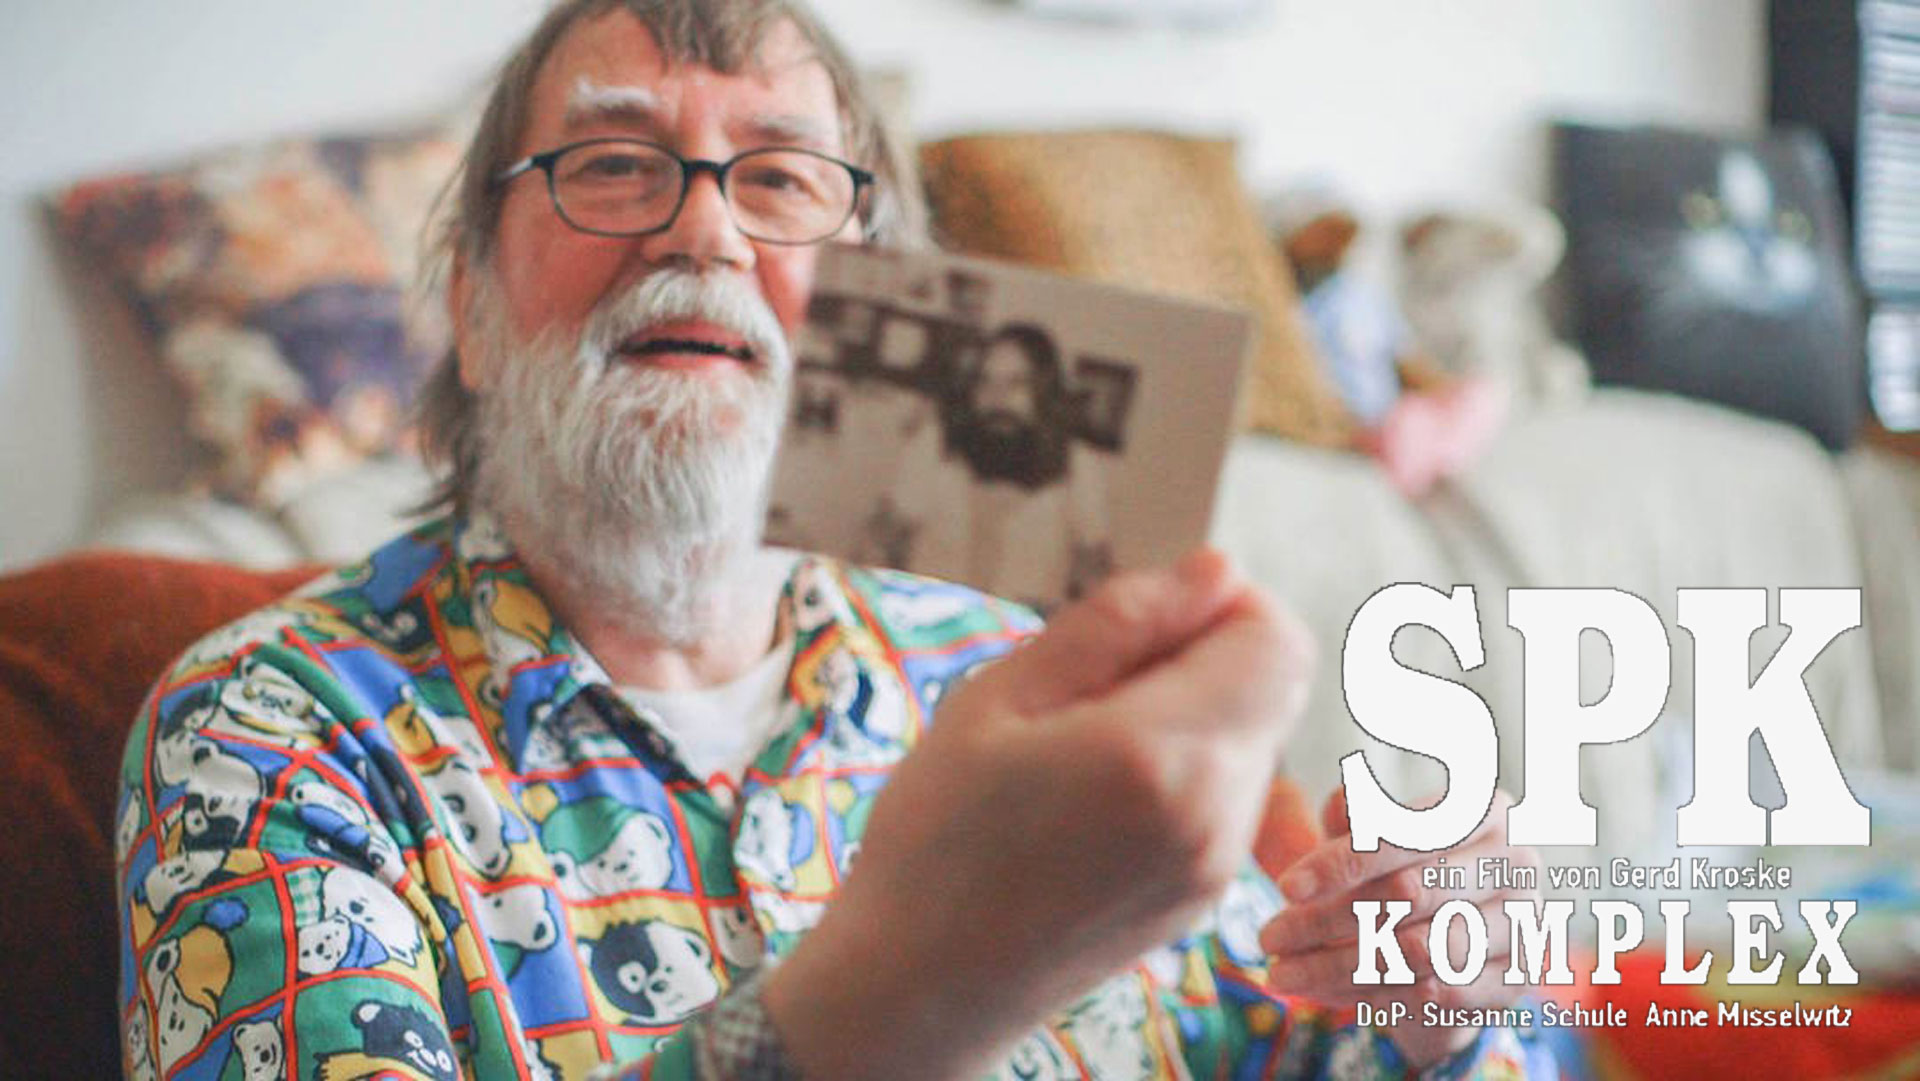 Titelbild des Films SPK Komples - Kamerafrau Anne Misselwitz